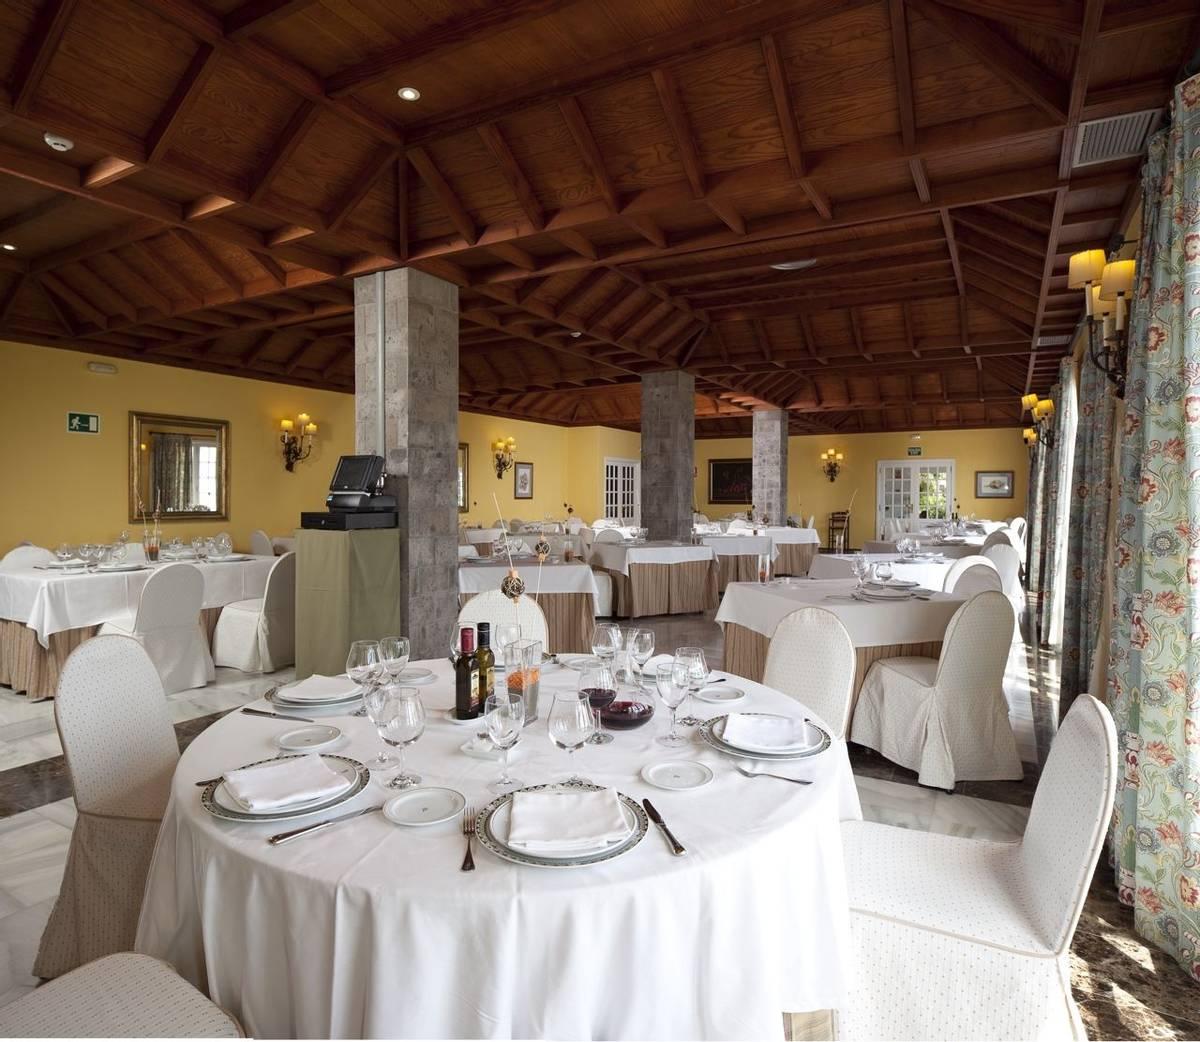 Spain - La Palma - Parador de La Palma -   47 restaurante.tif